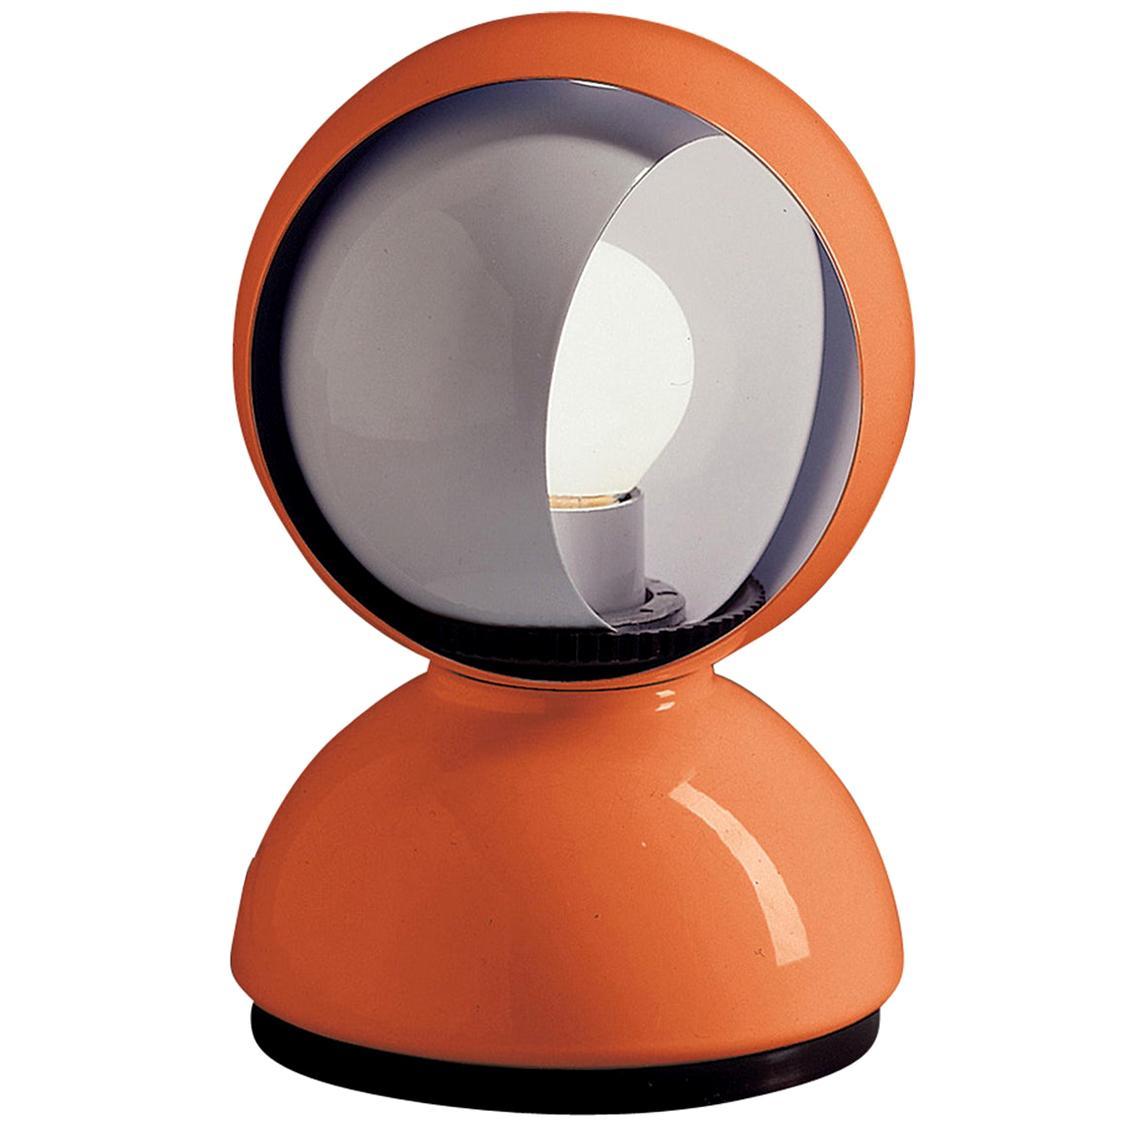 Vico Magistretti Eclisse Table Lamp in Orange for Artemide